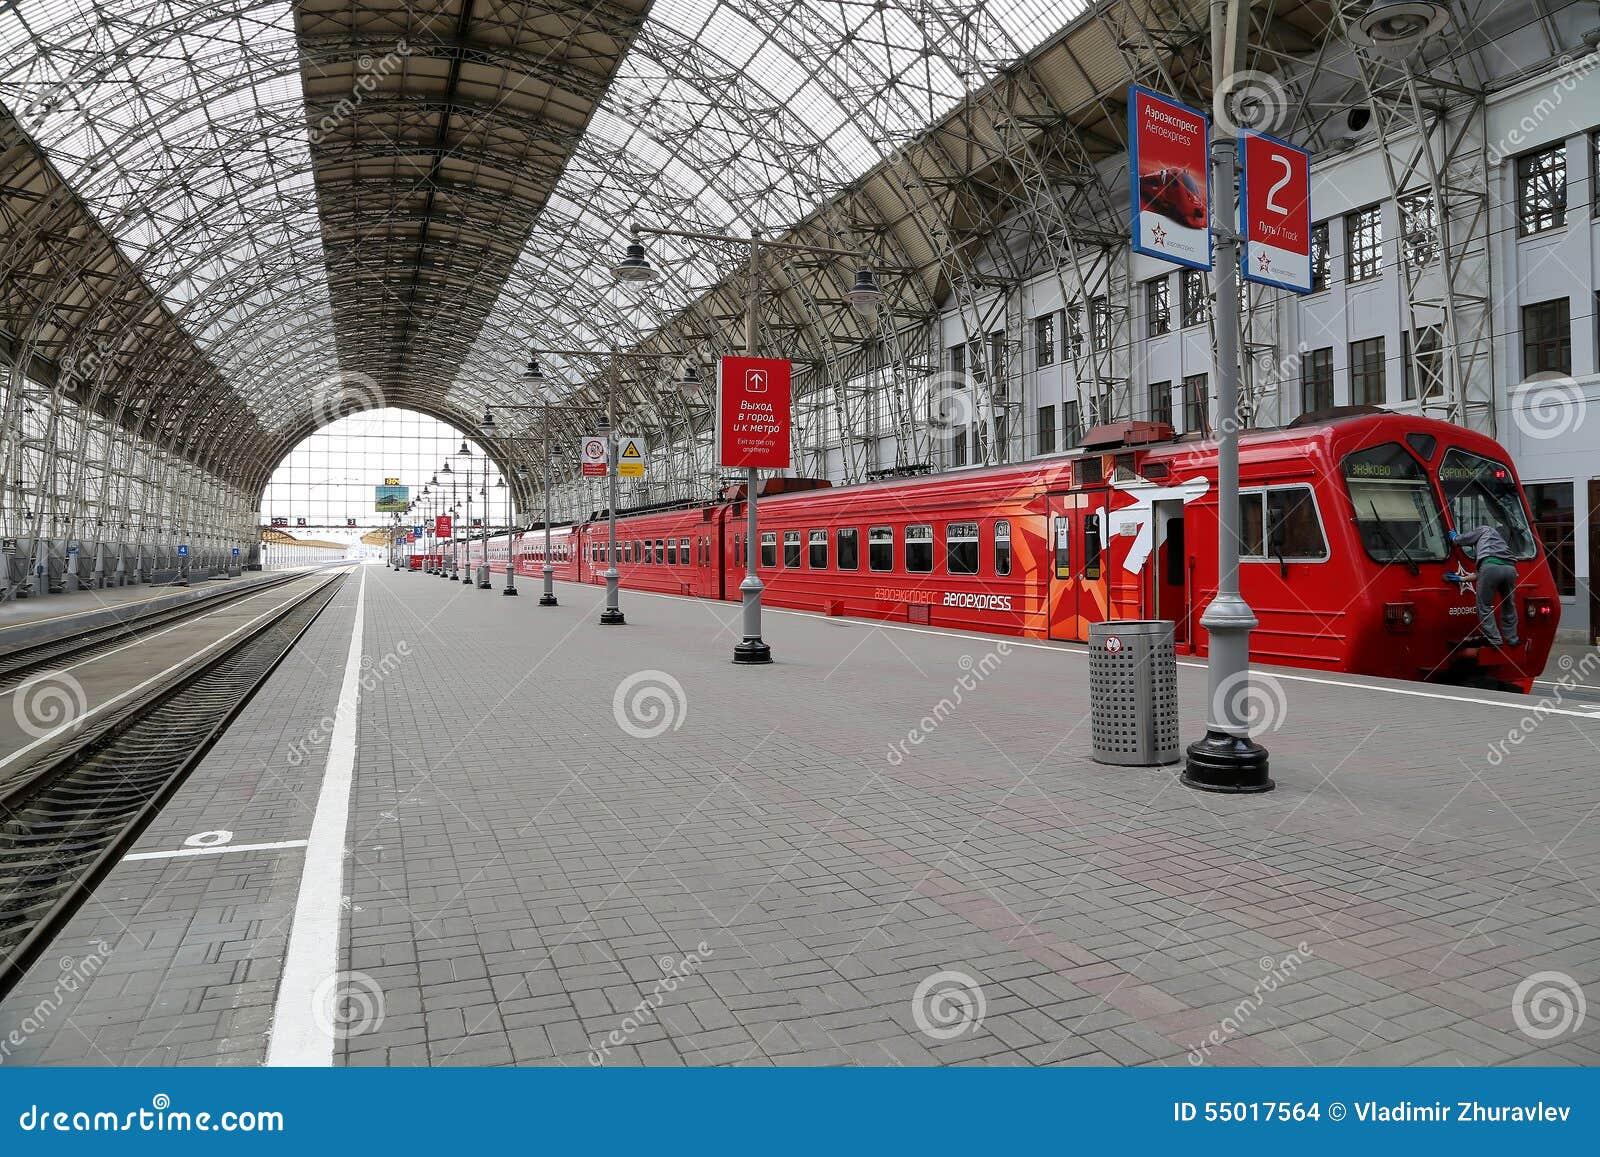 Aeroexpress rode Trein op Kiyevskaya-station (Kiyevsky-spoorwegterminal, vokzal Kievskiy), Moskou, Rusland